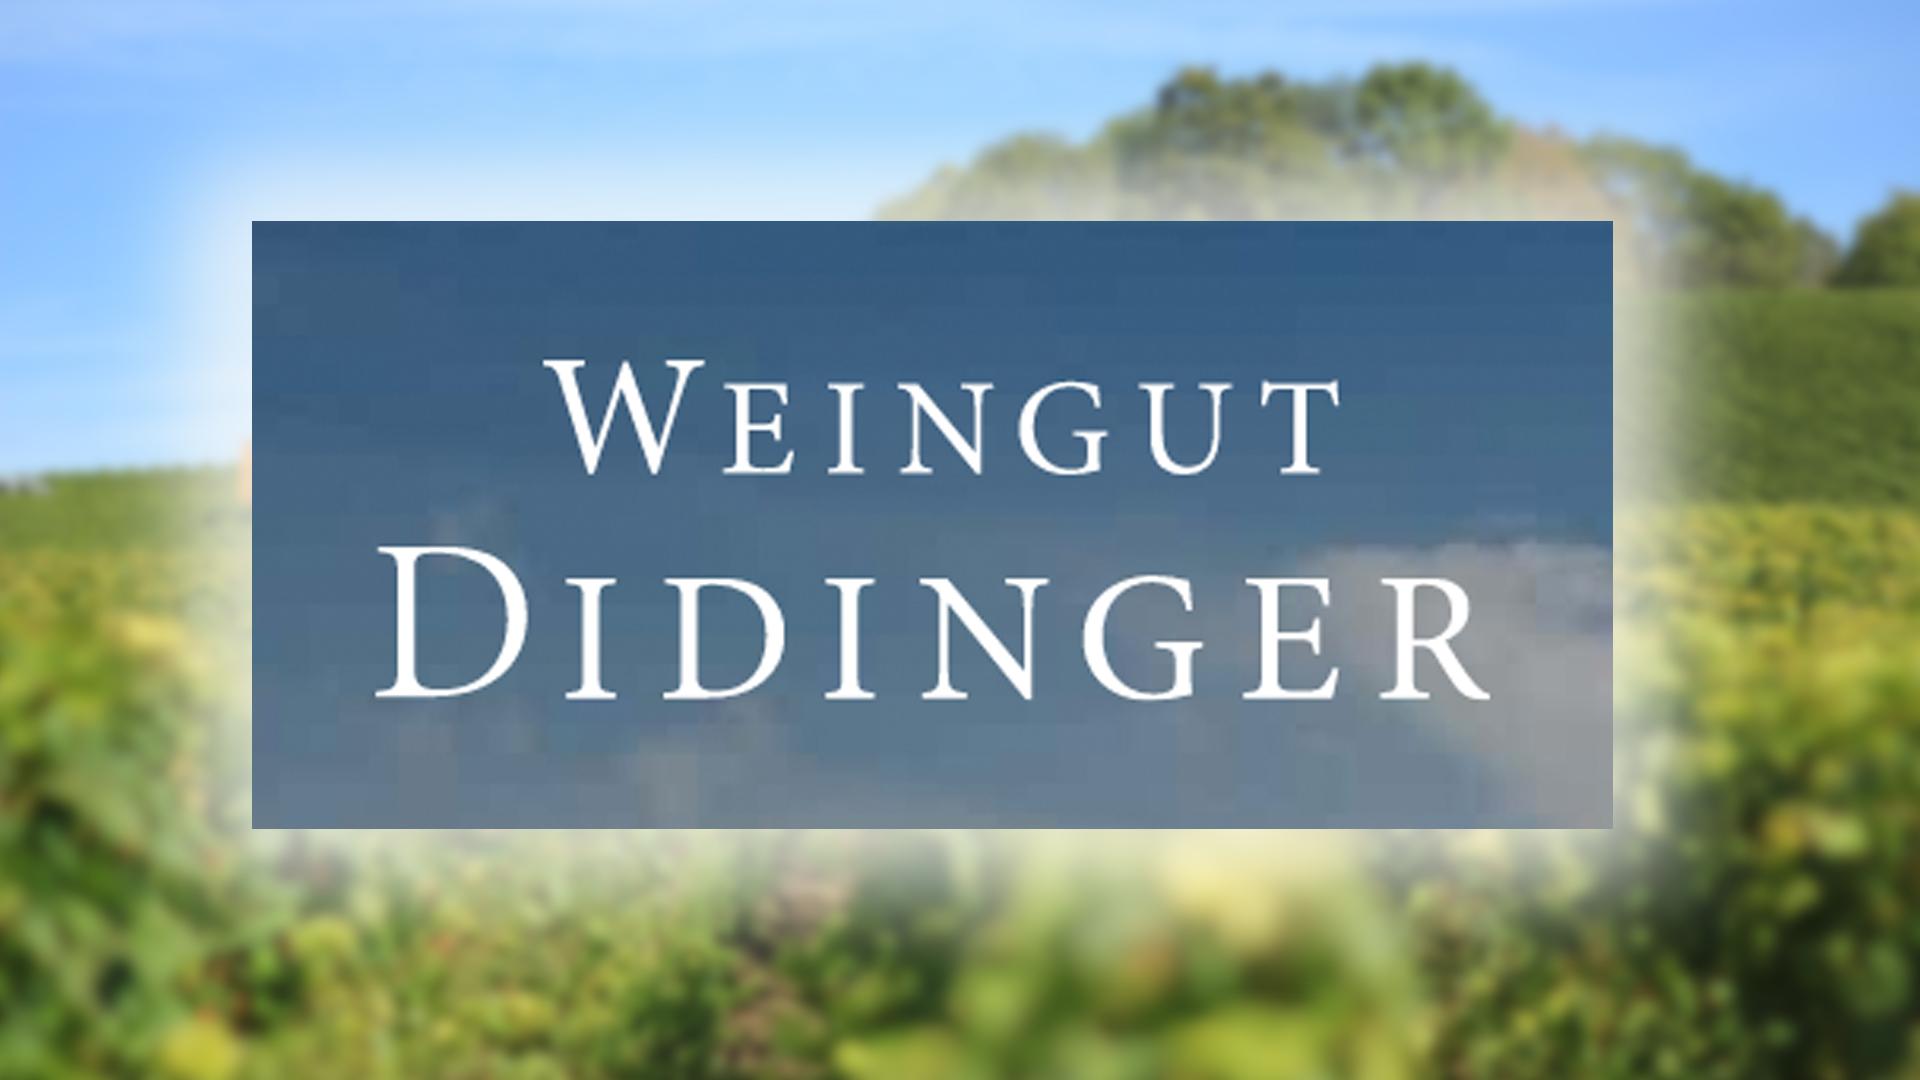 Jens Didinger – Didinger winery